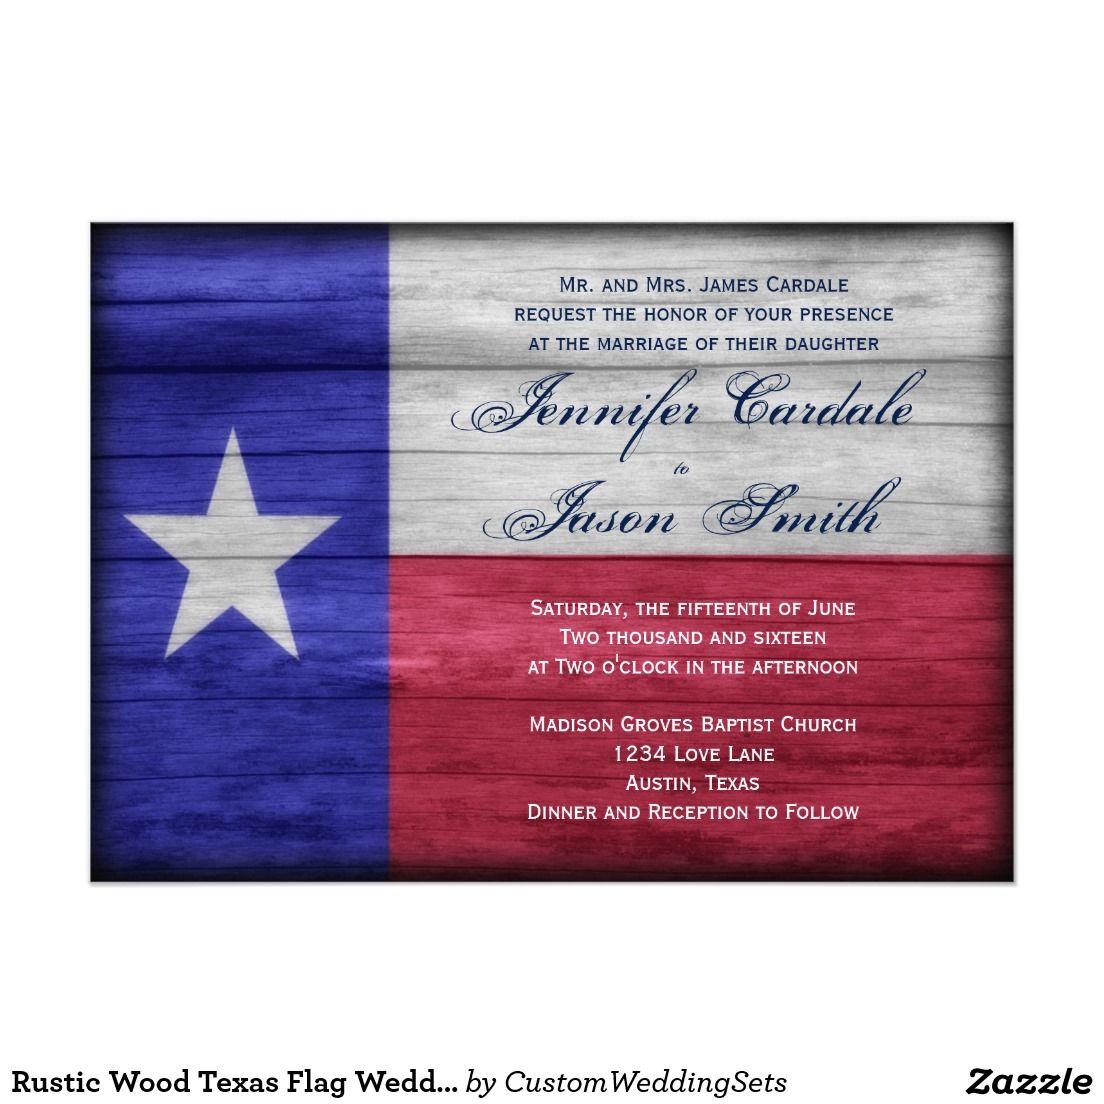 Rustic Wood Texas Flag Wedding Invitations | Pinterest | Texas flags ...